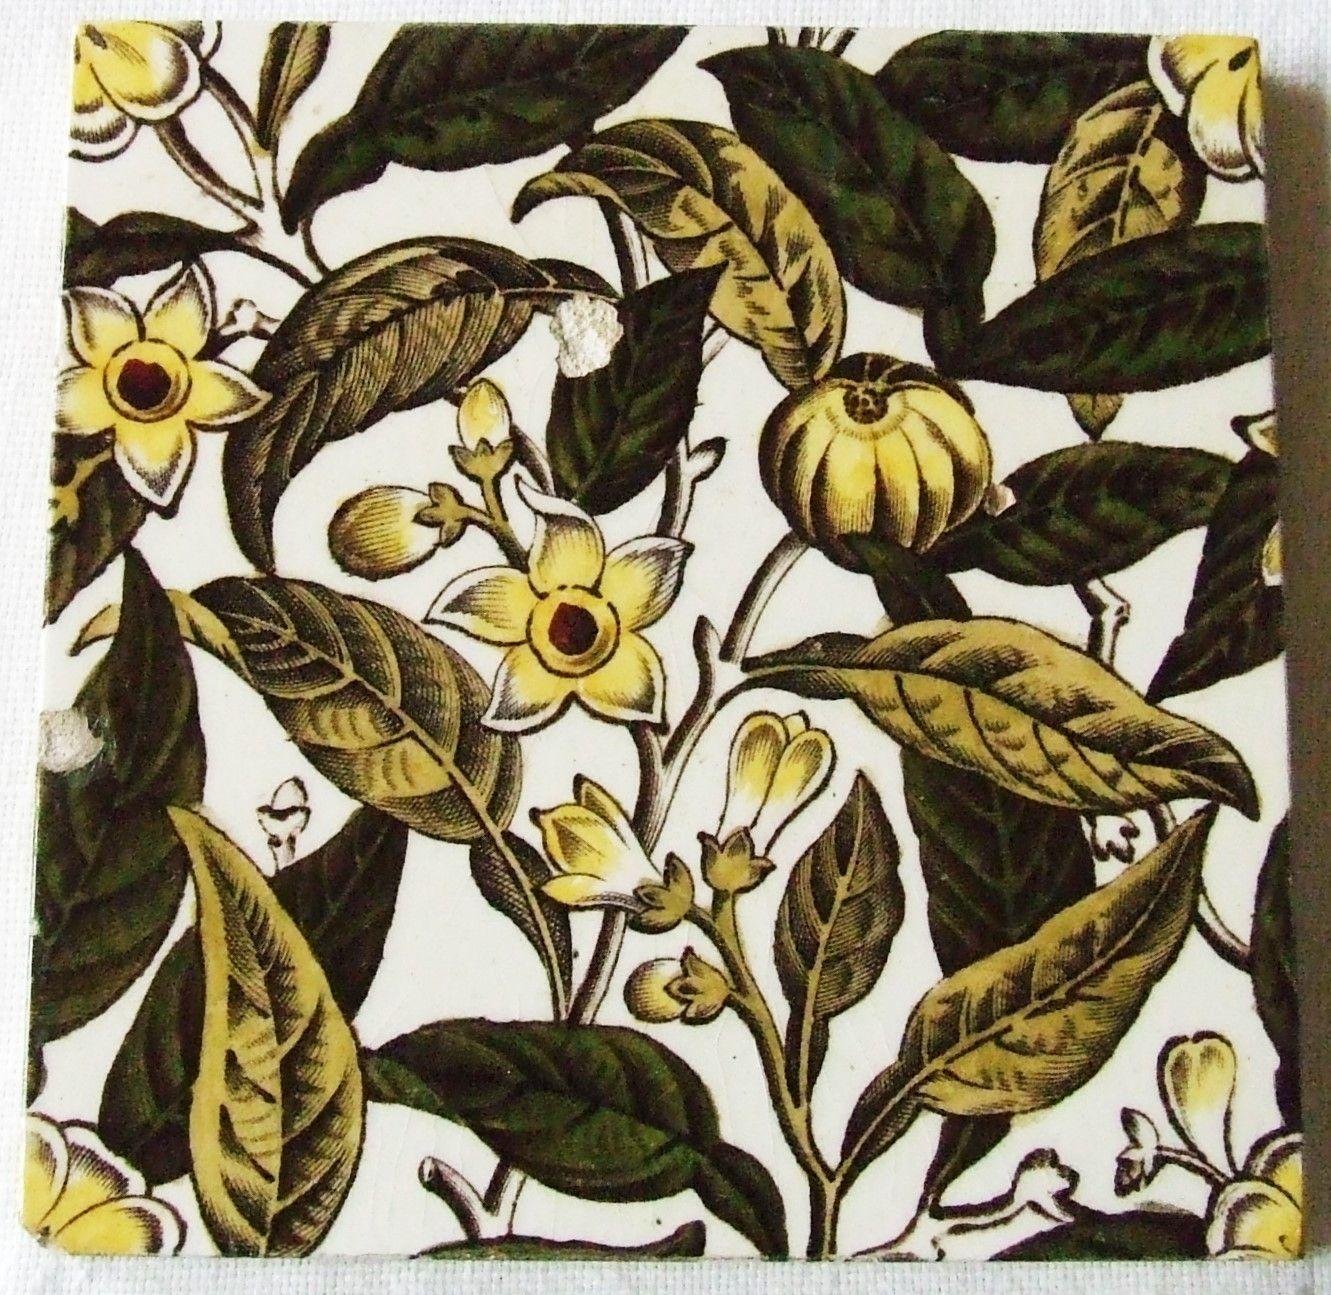 Antique English Tranfer Tile Botanical Sherwin Cotton Aesthetic Arts & Crafts